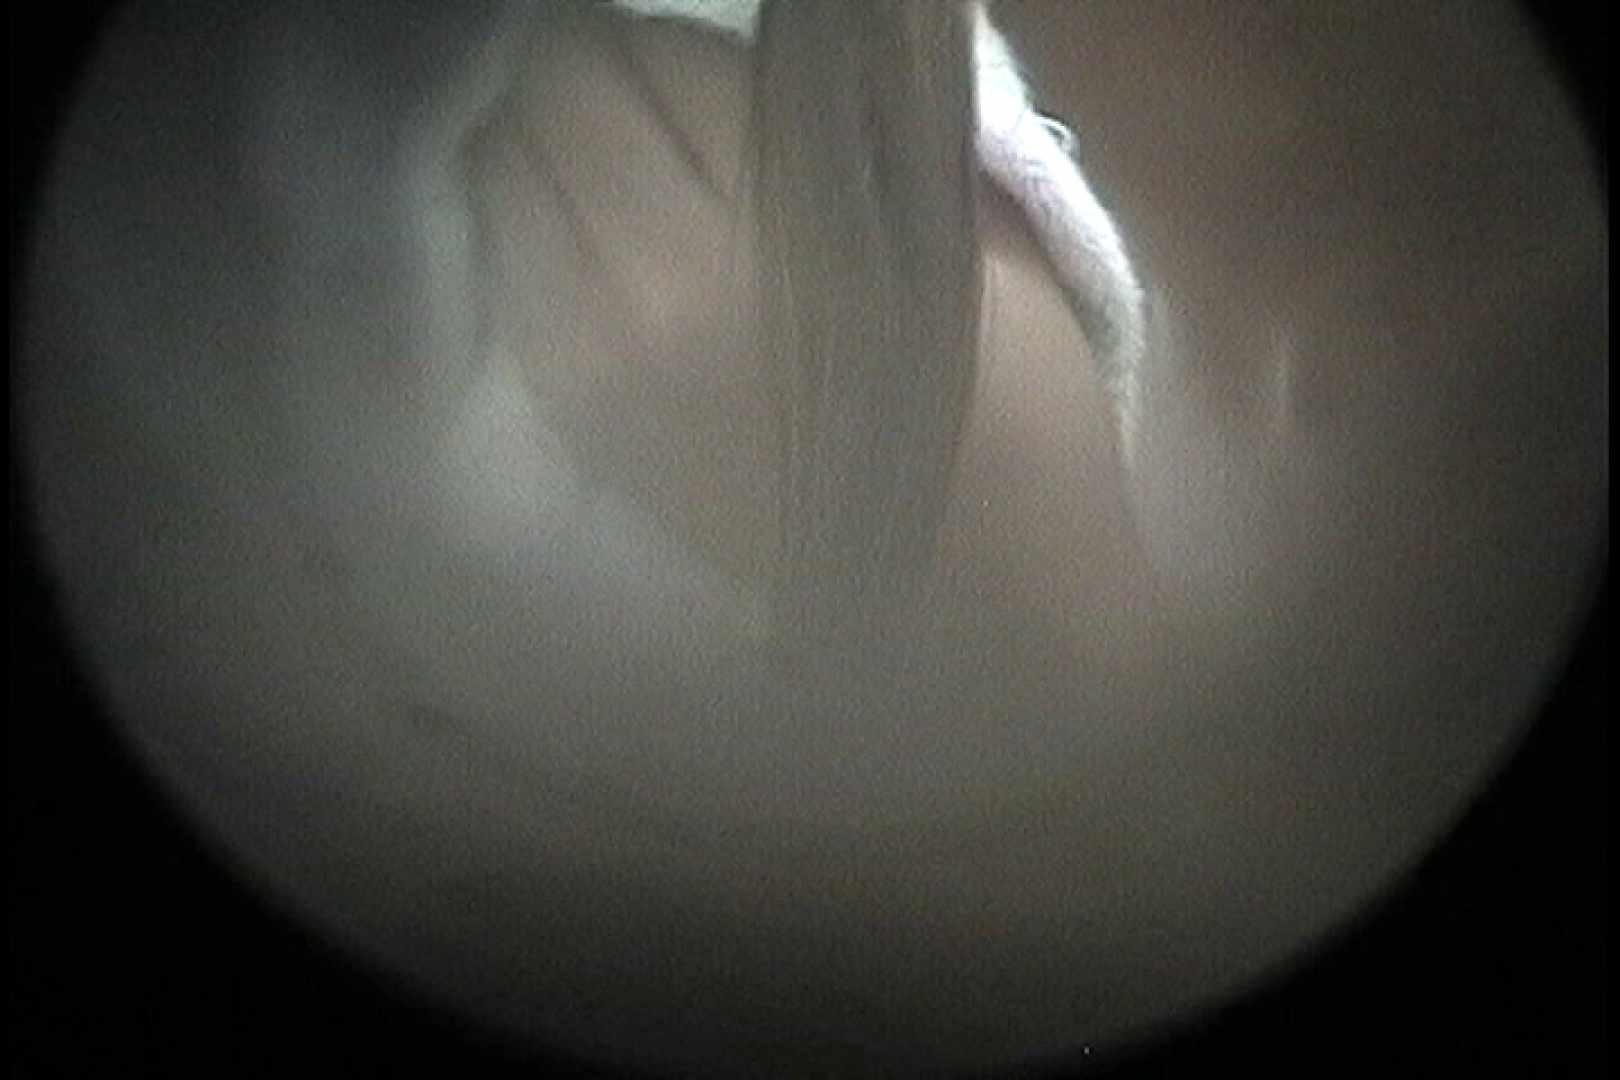 No.22 日焼け跡とオッパイの関係がおかしな貧乳ギャル 超エロギャル 盗み撮り動画キャプチャ 99枚 10